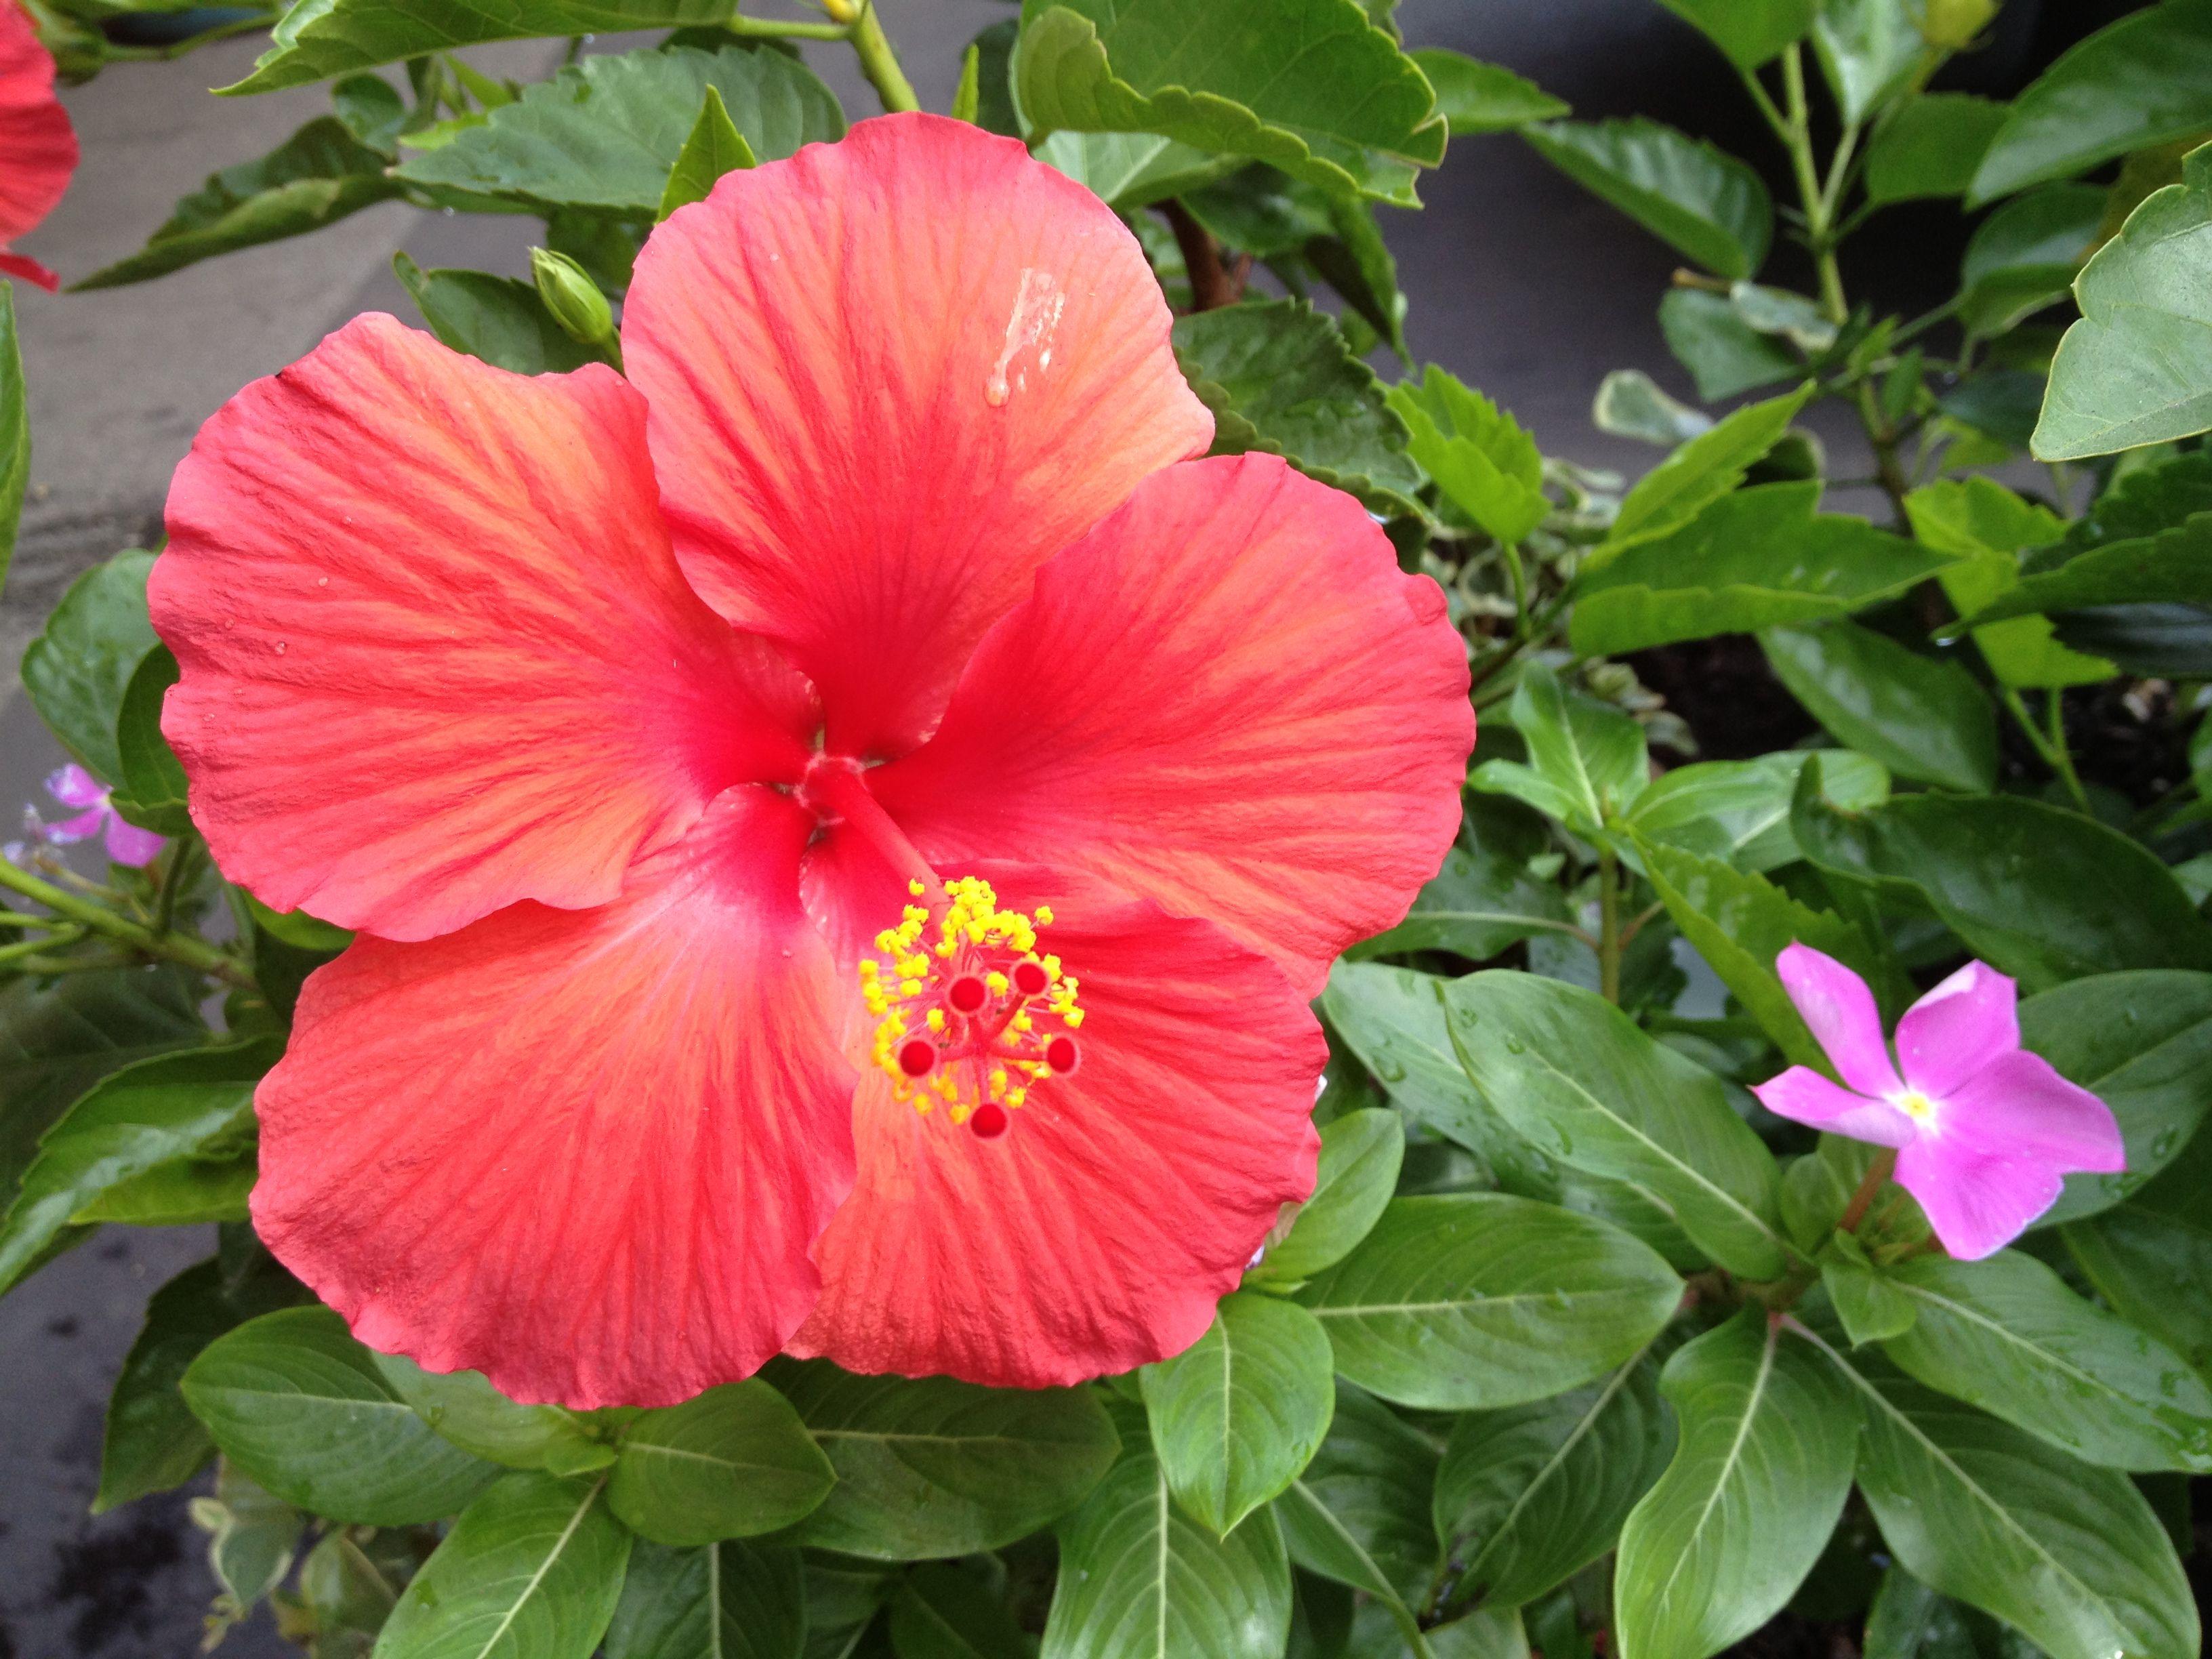 Amapola My Fav Flower Hibiscus Flowers Blossom